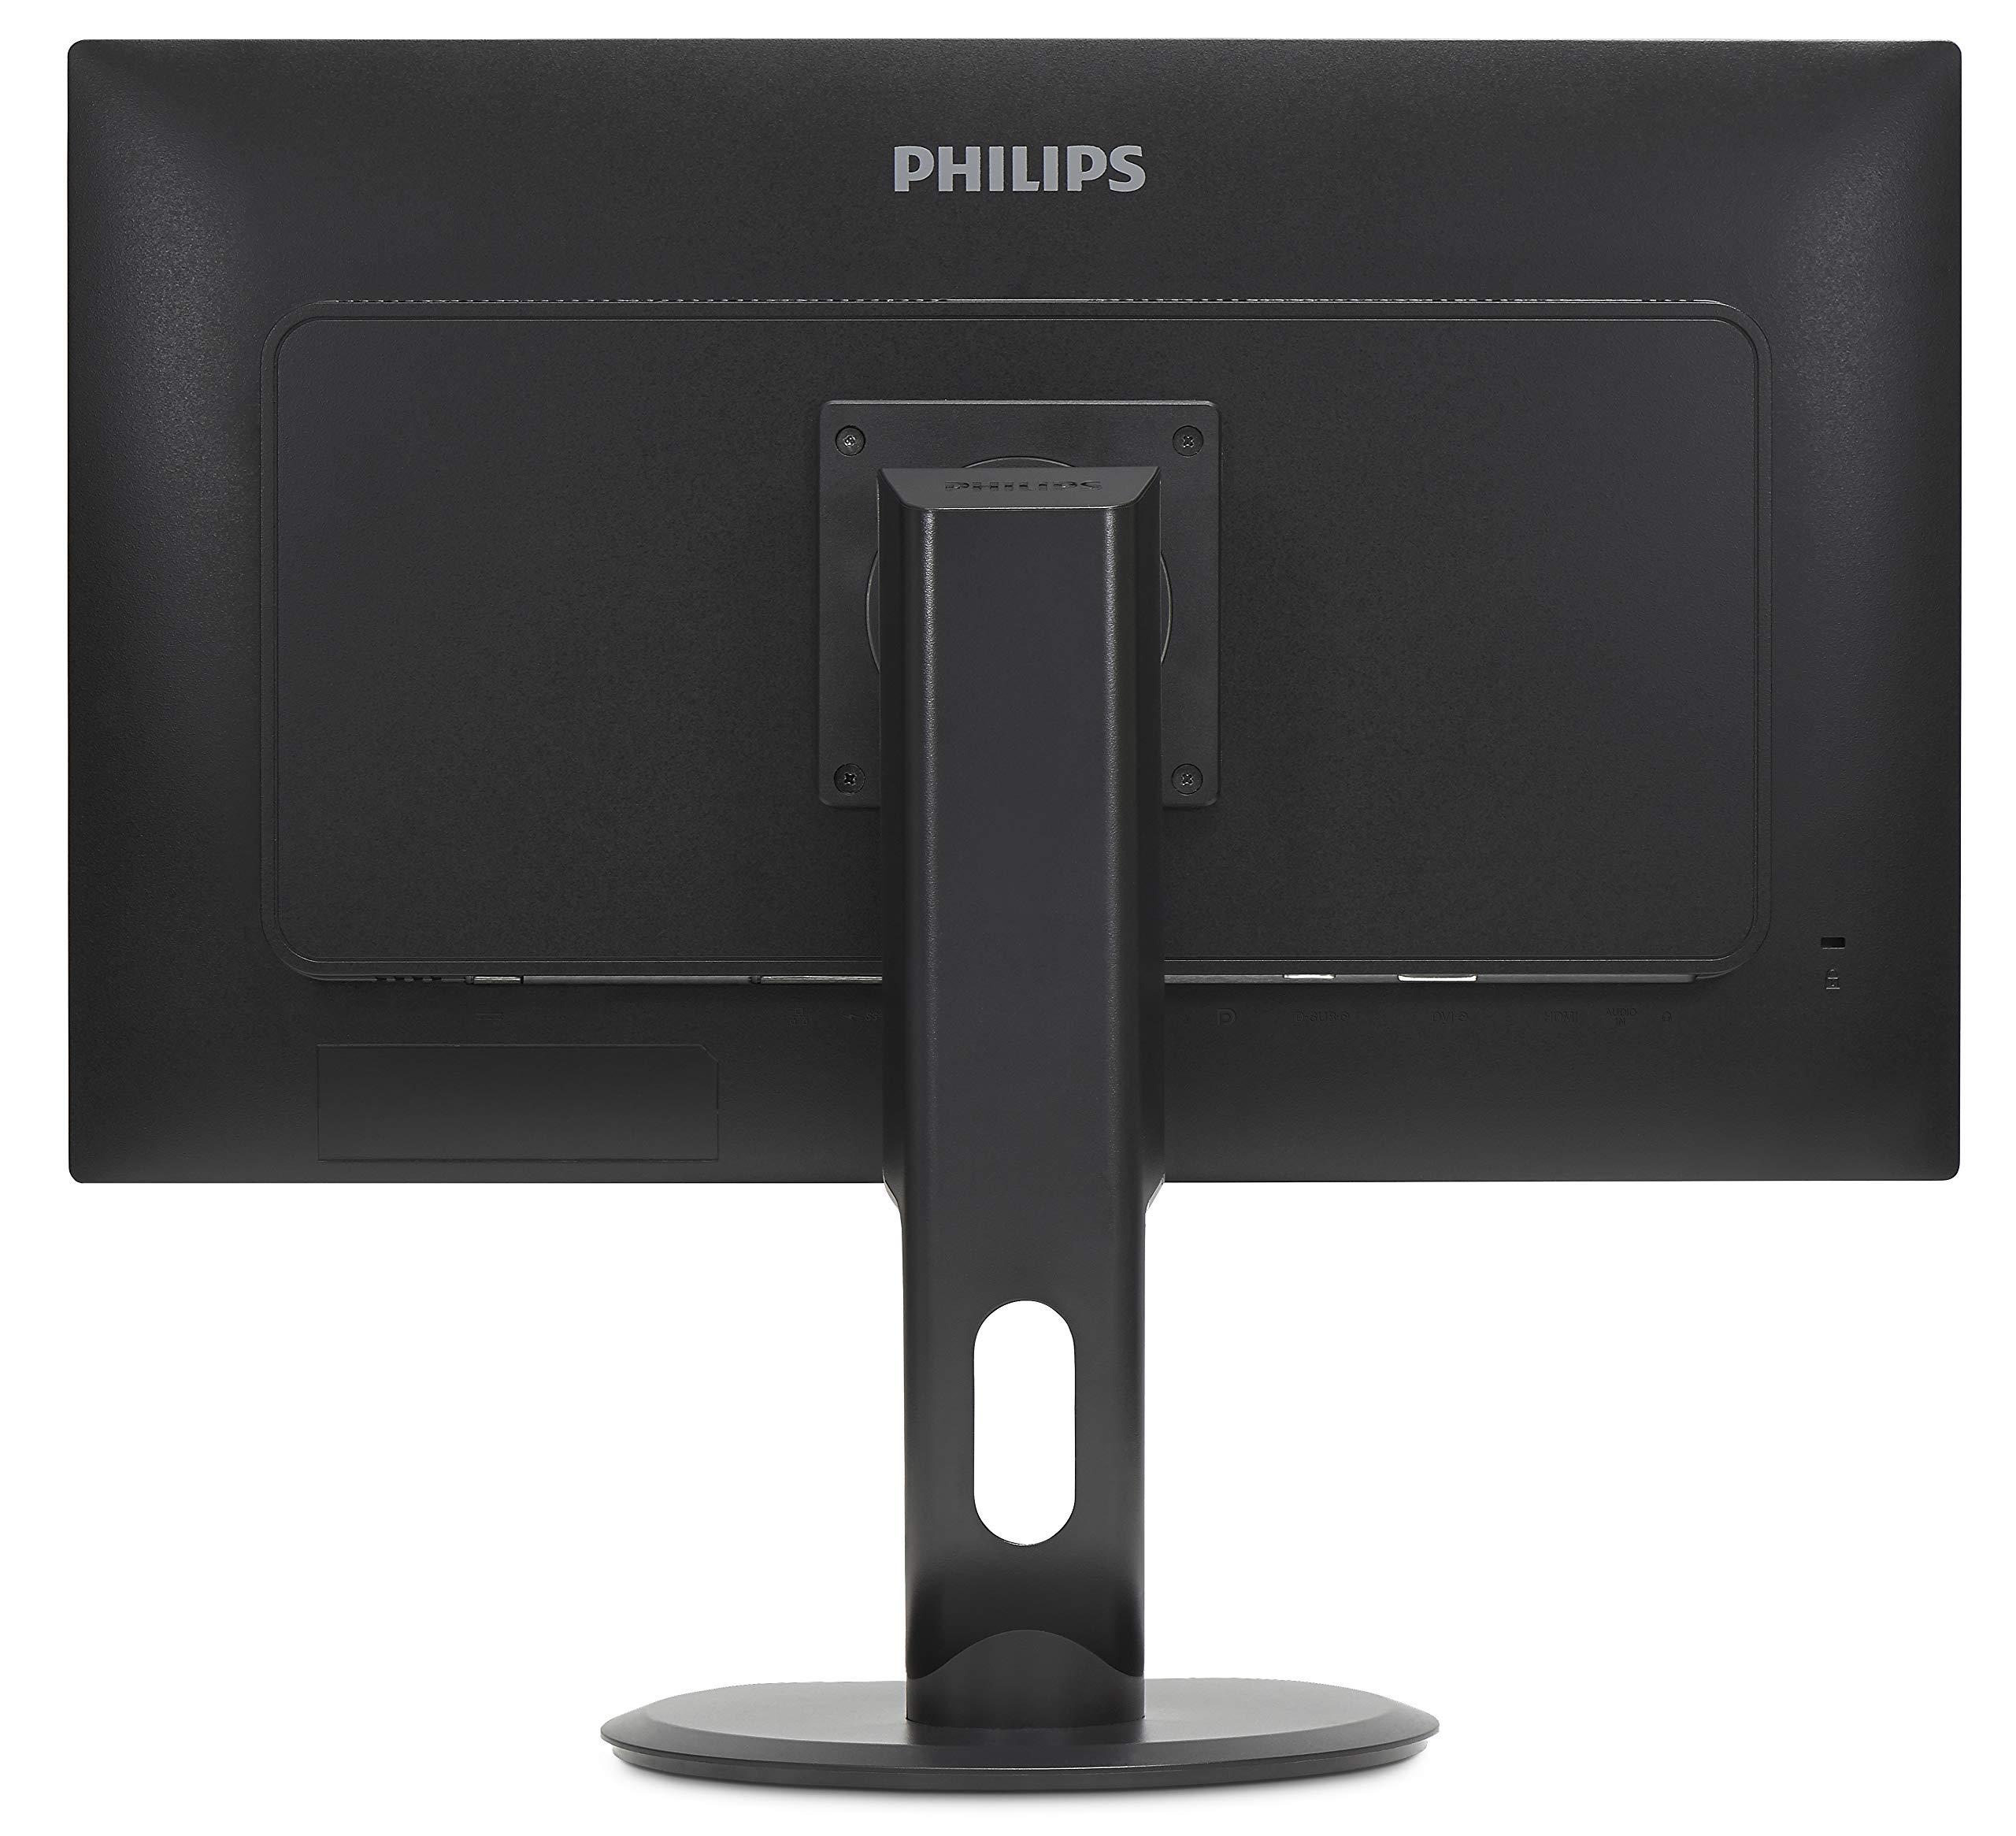 "Philips 276E8FJAB 27"" Class IPS Slim LED Monitor, 2560 x 1440, 350cd/m2, 4ms, Speakers, VGA, DisplayPort, HDMI 7"